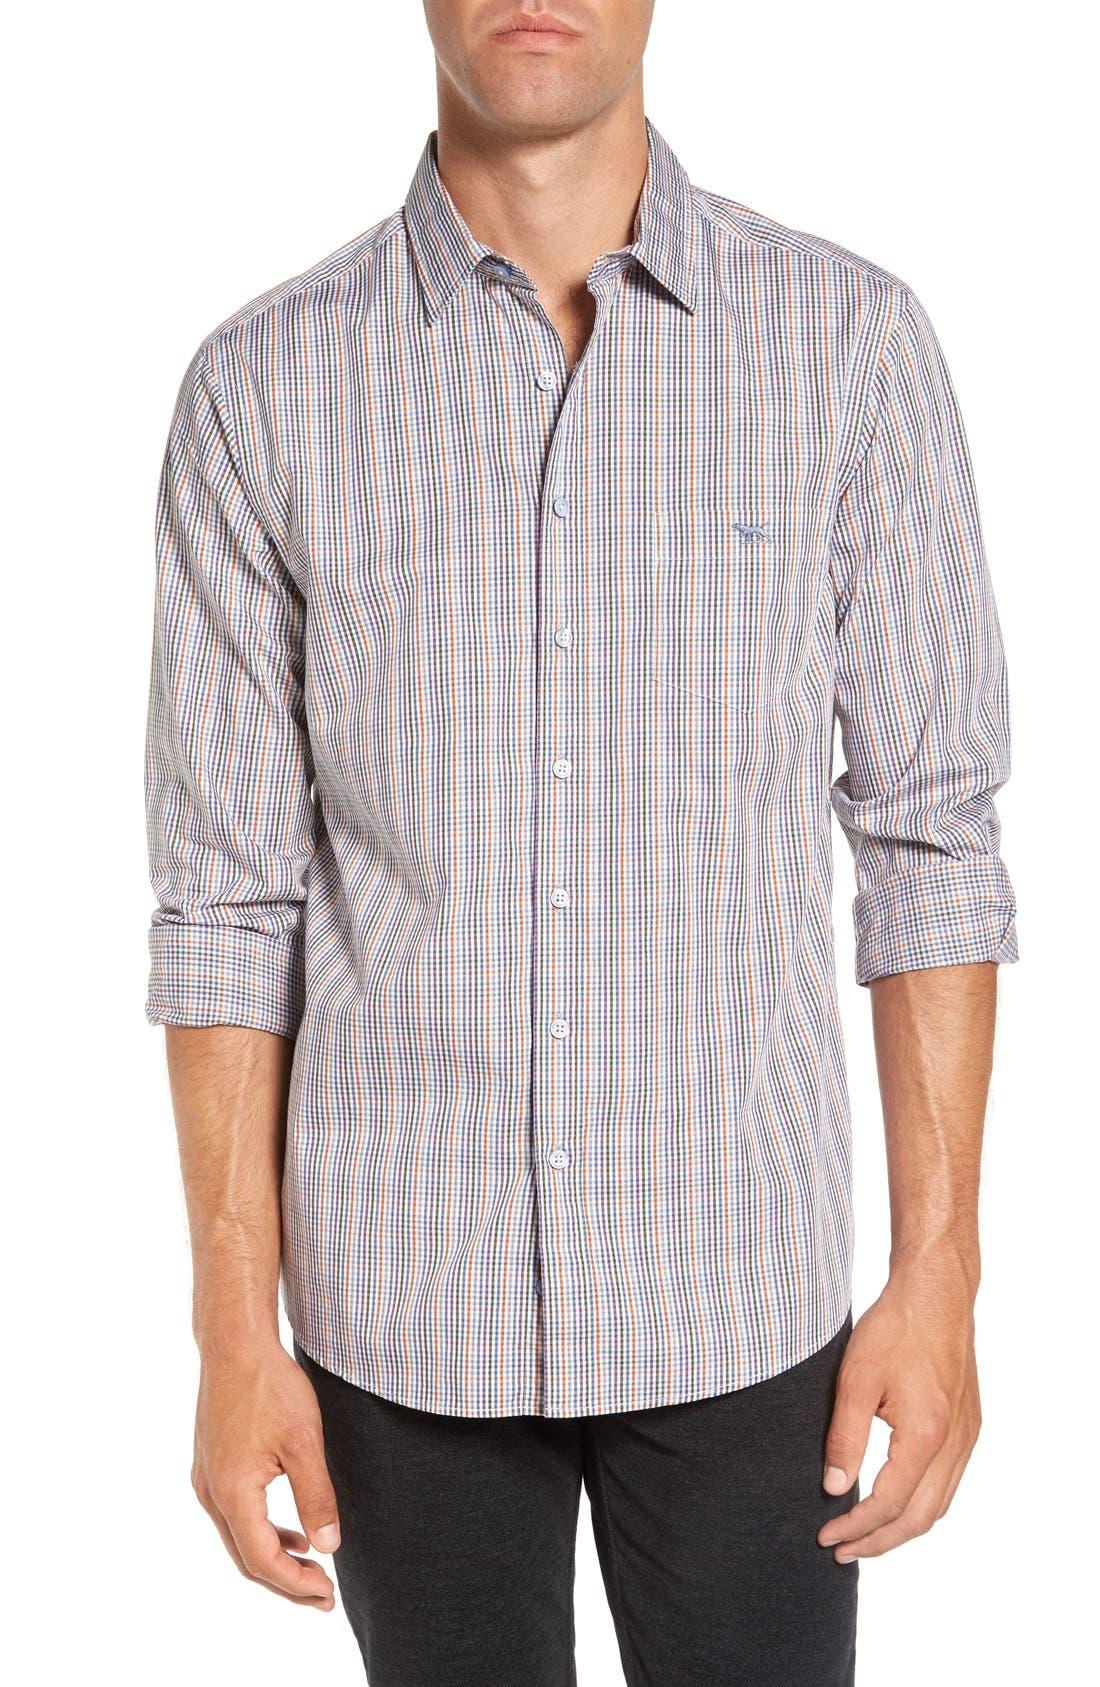 Image of RODD AND GUNN Springhill Lane Long Sleeve Original Fit Shirt